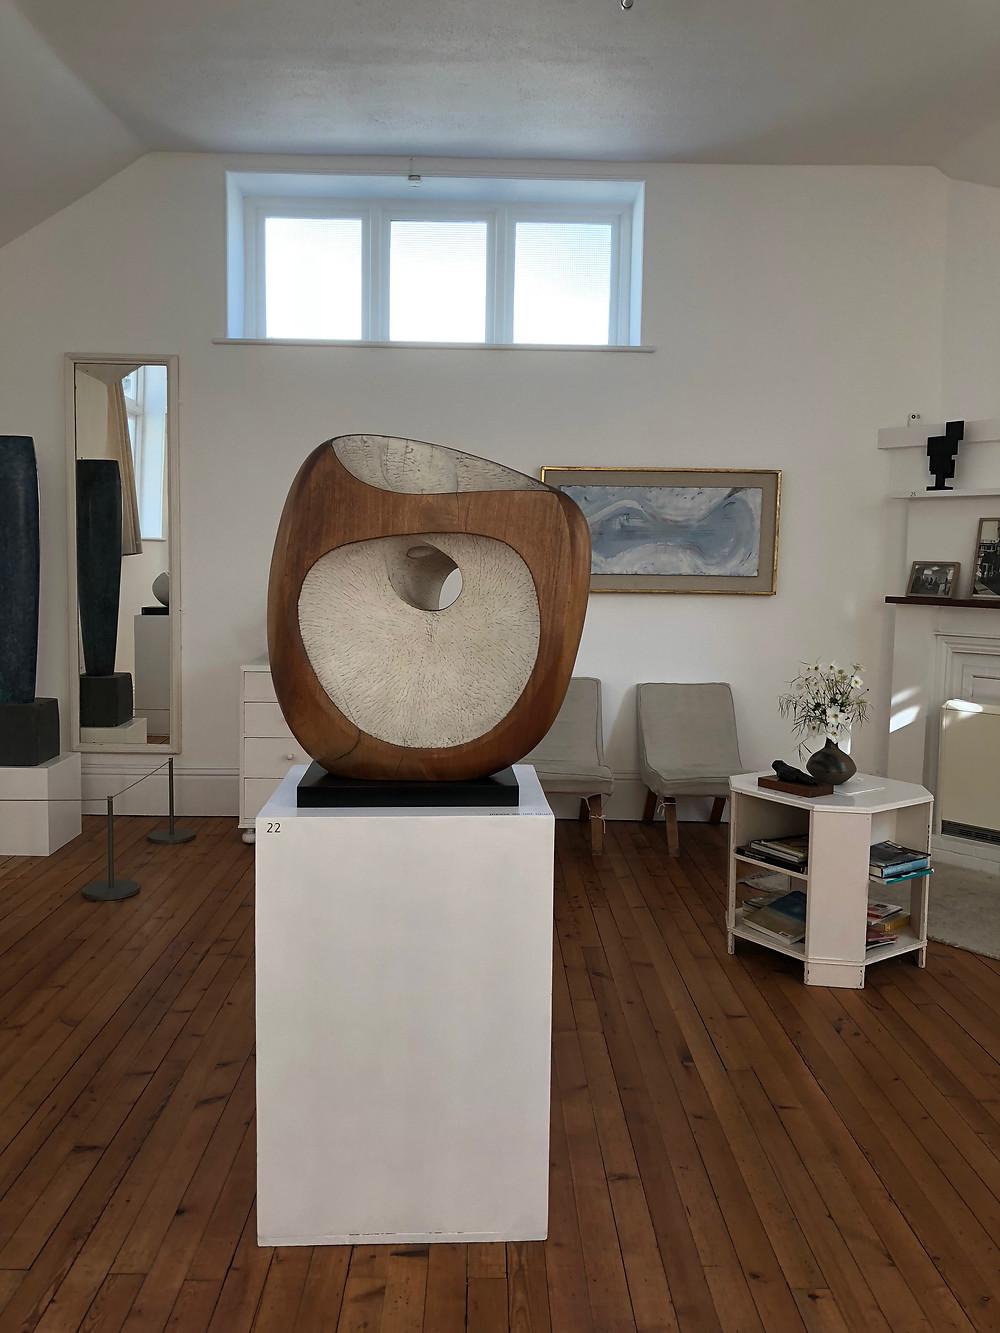 sculpture Barbara Hepworth Tate St Ives Cornwall British art